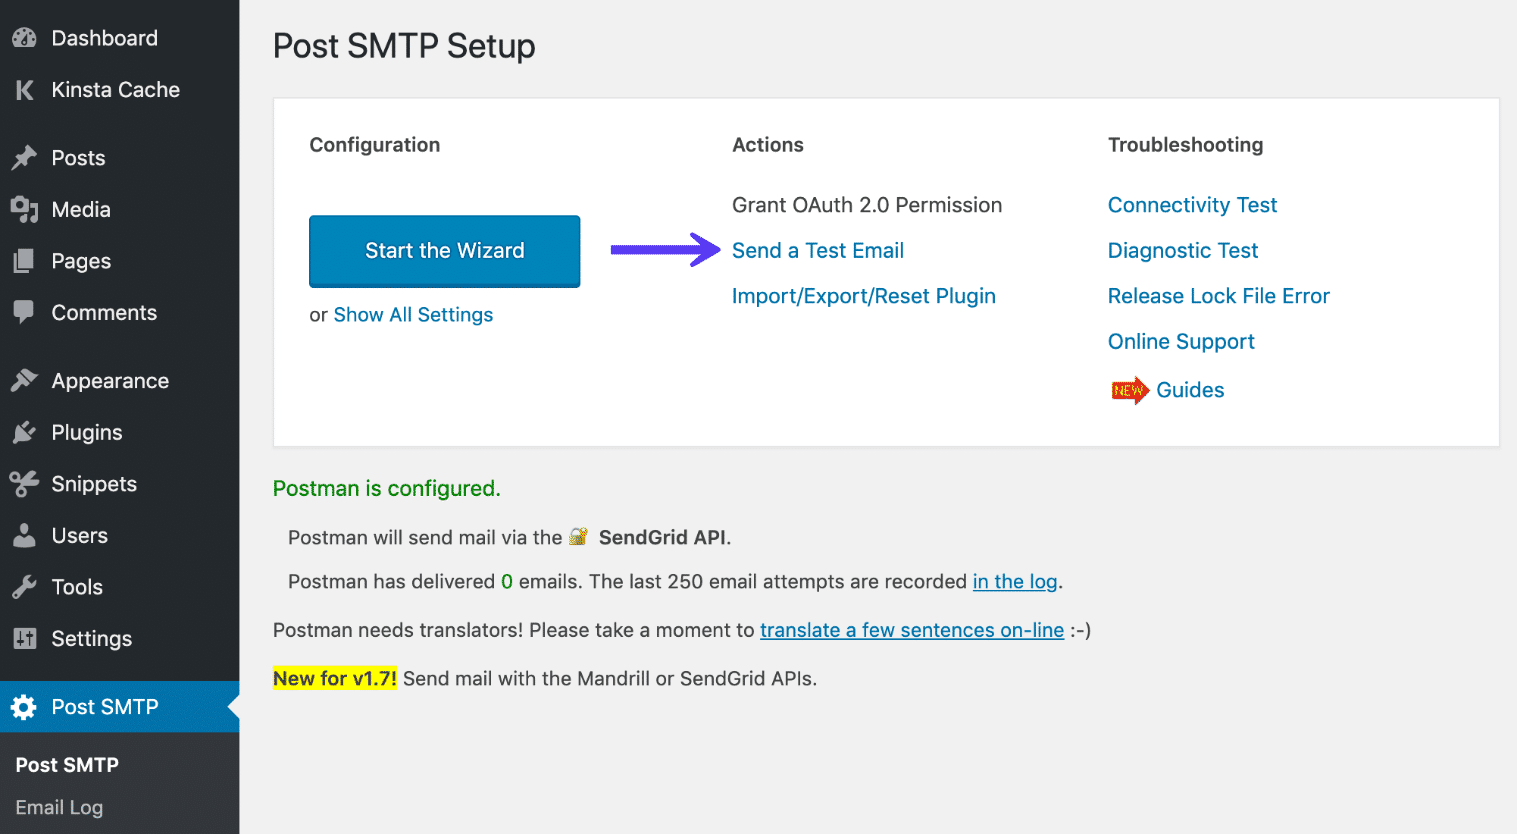 Post SMTPのテストメール送信